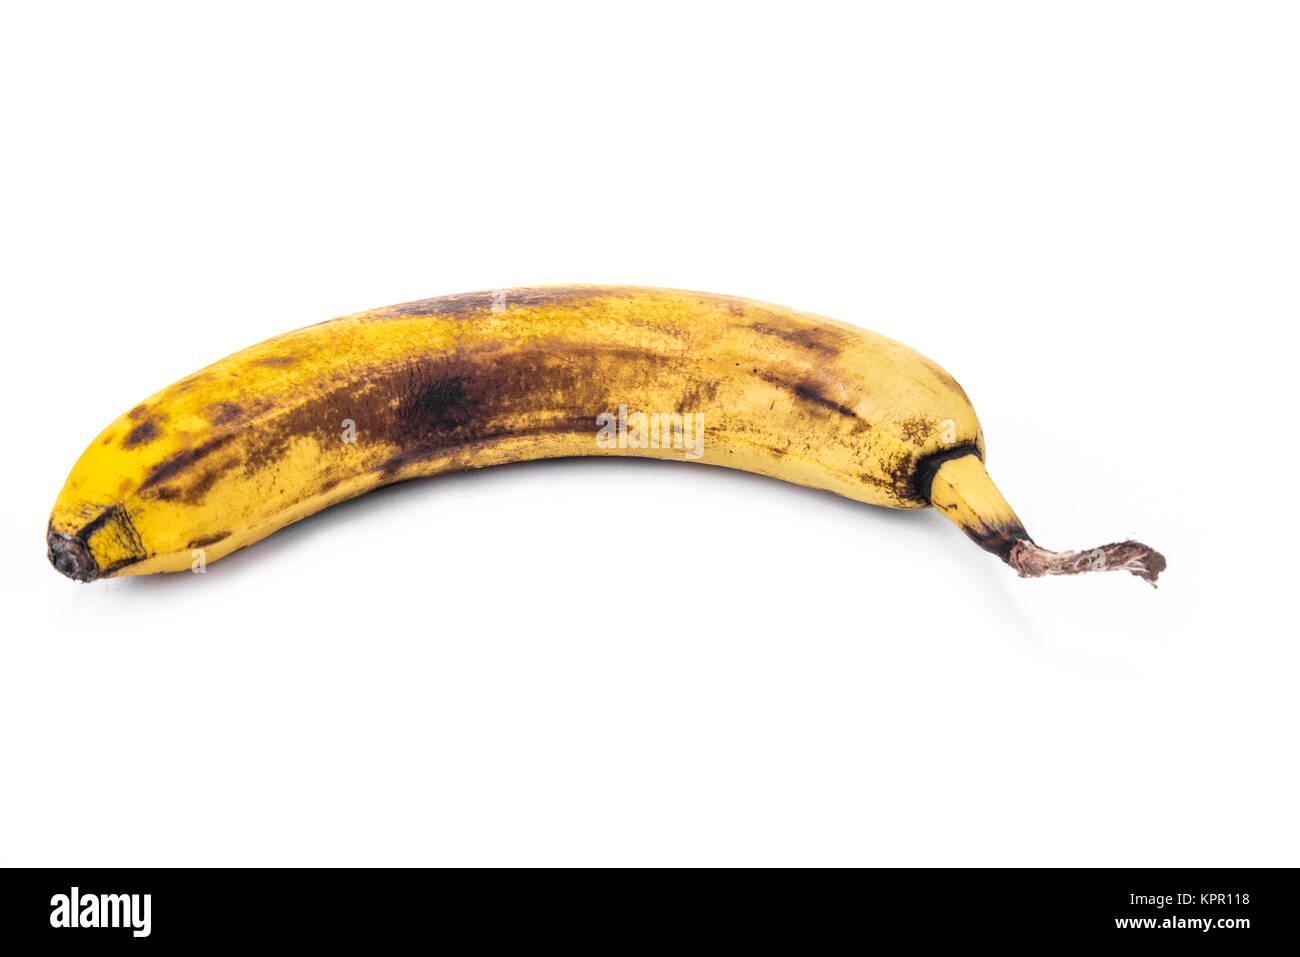 Overripe banana on the white background - Stock Image